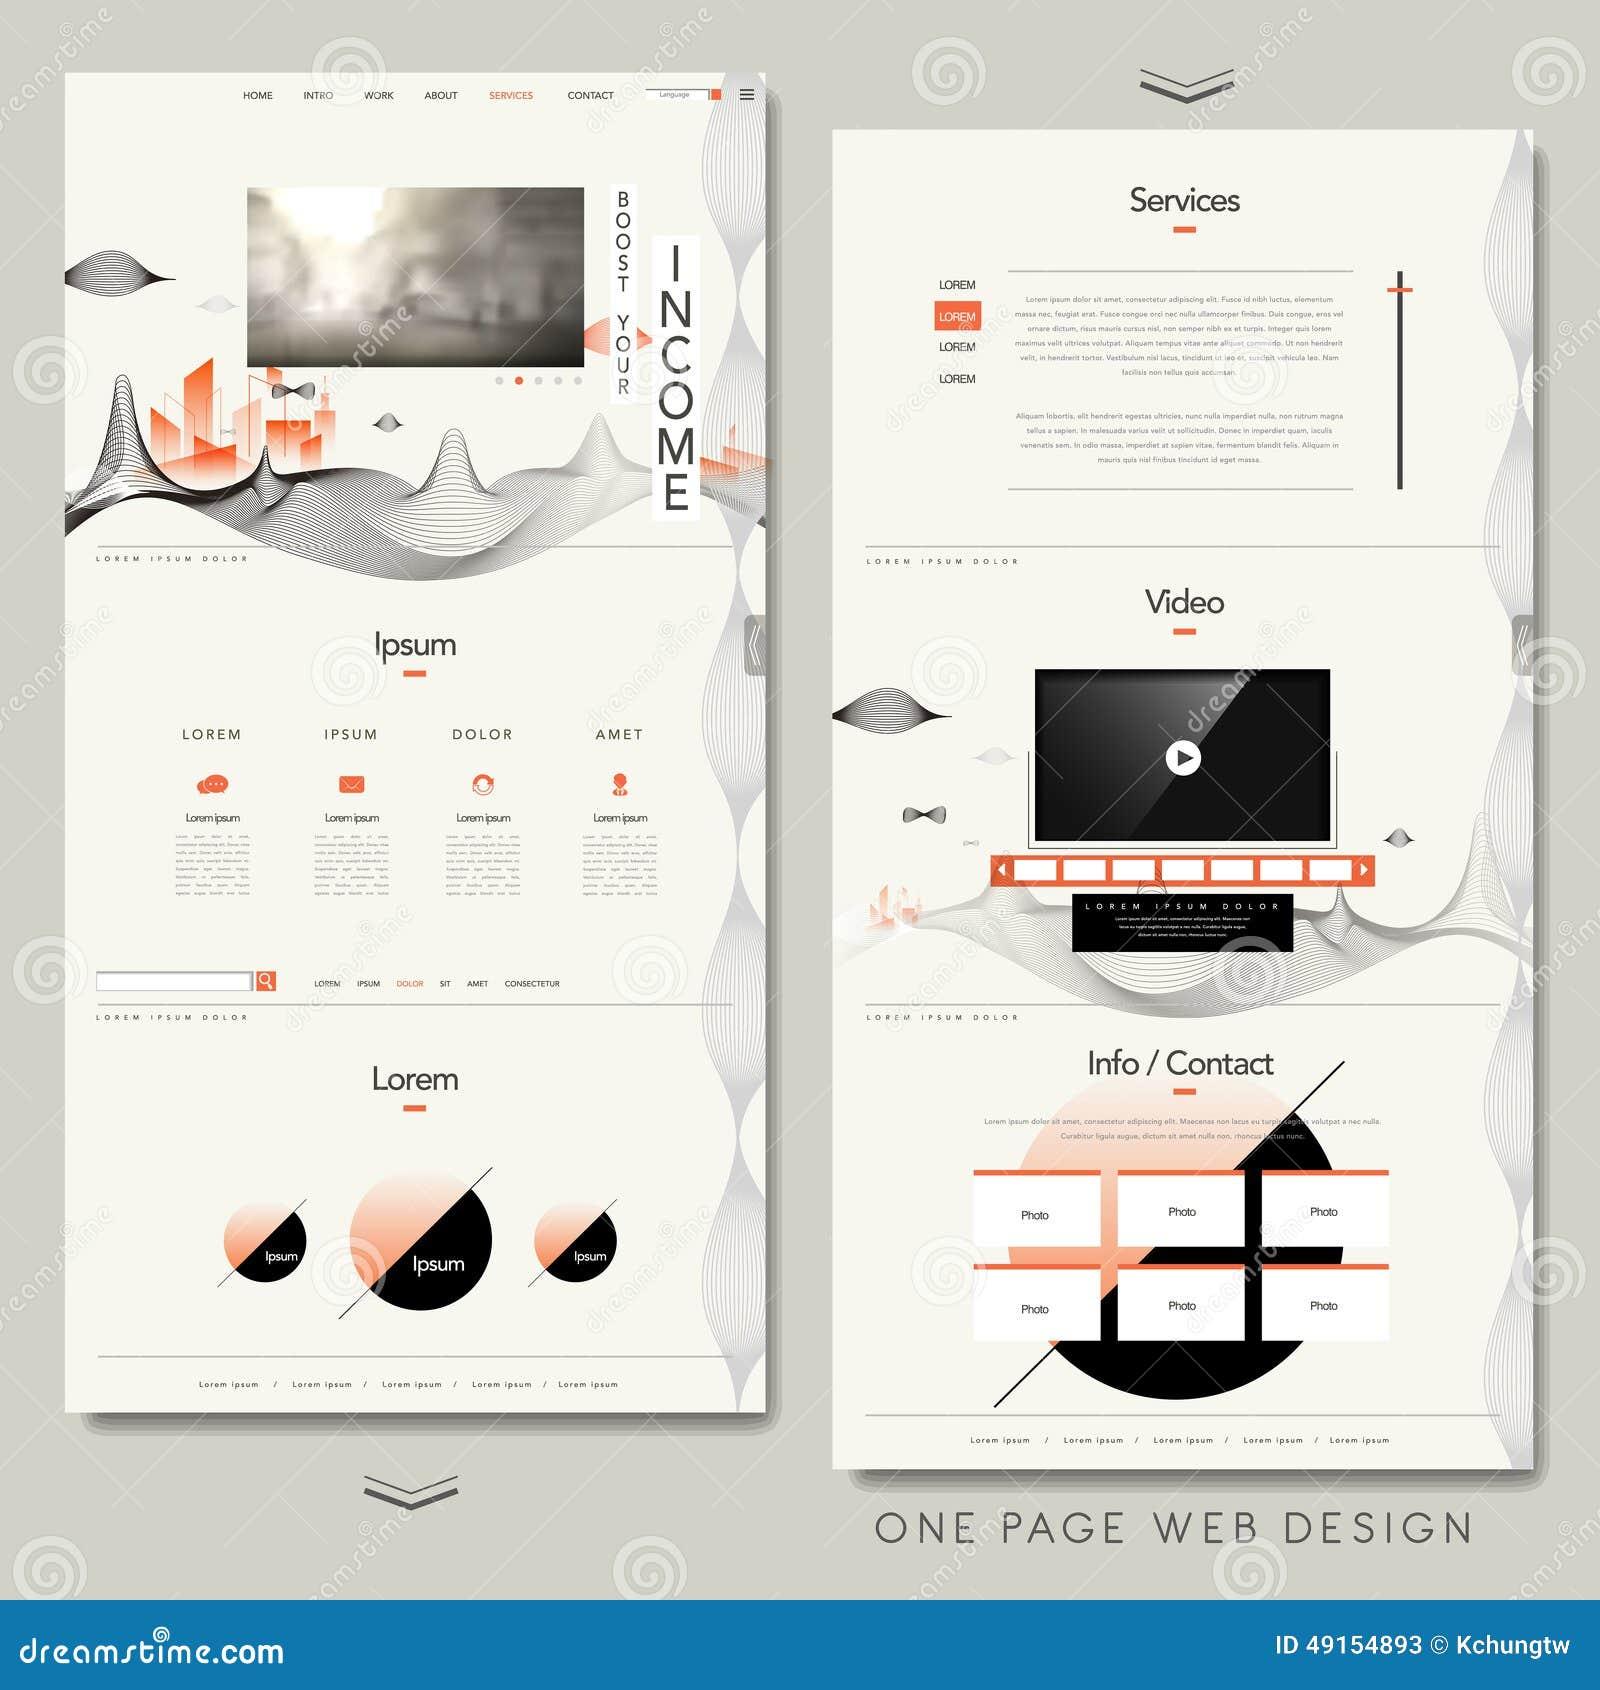 1 page web design